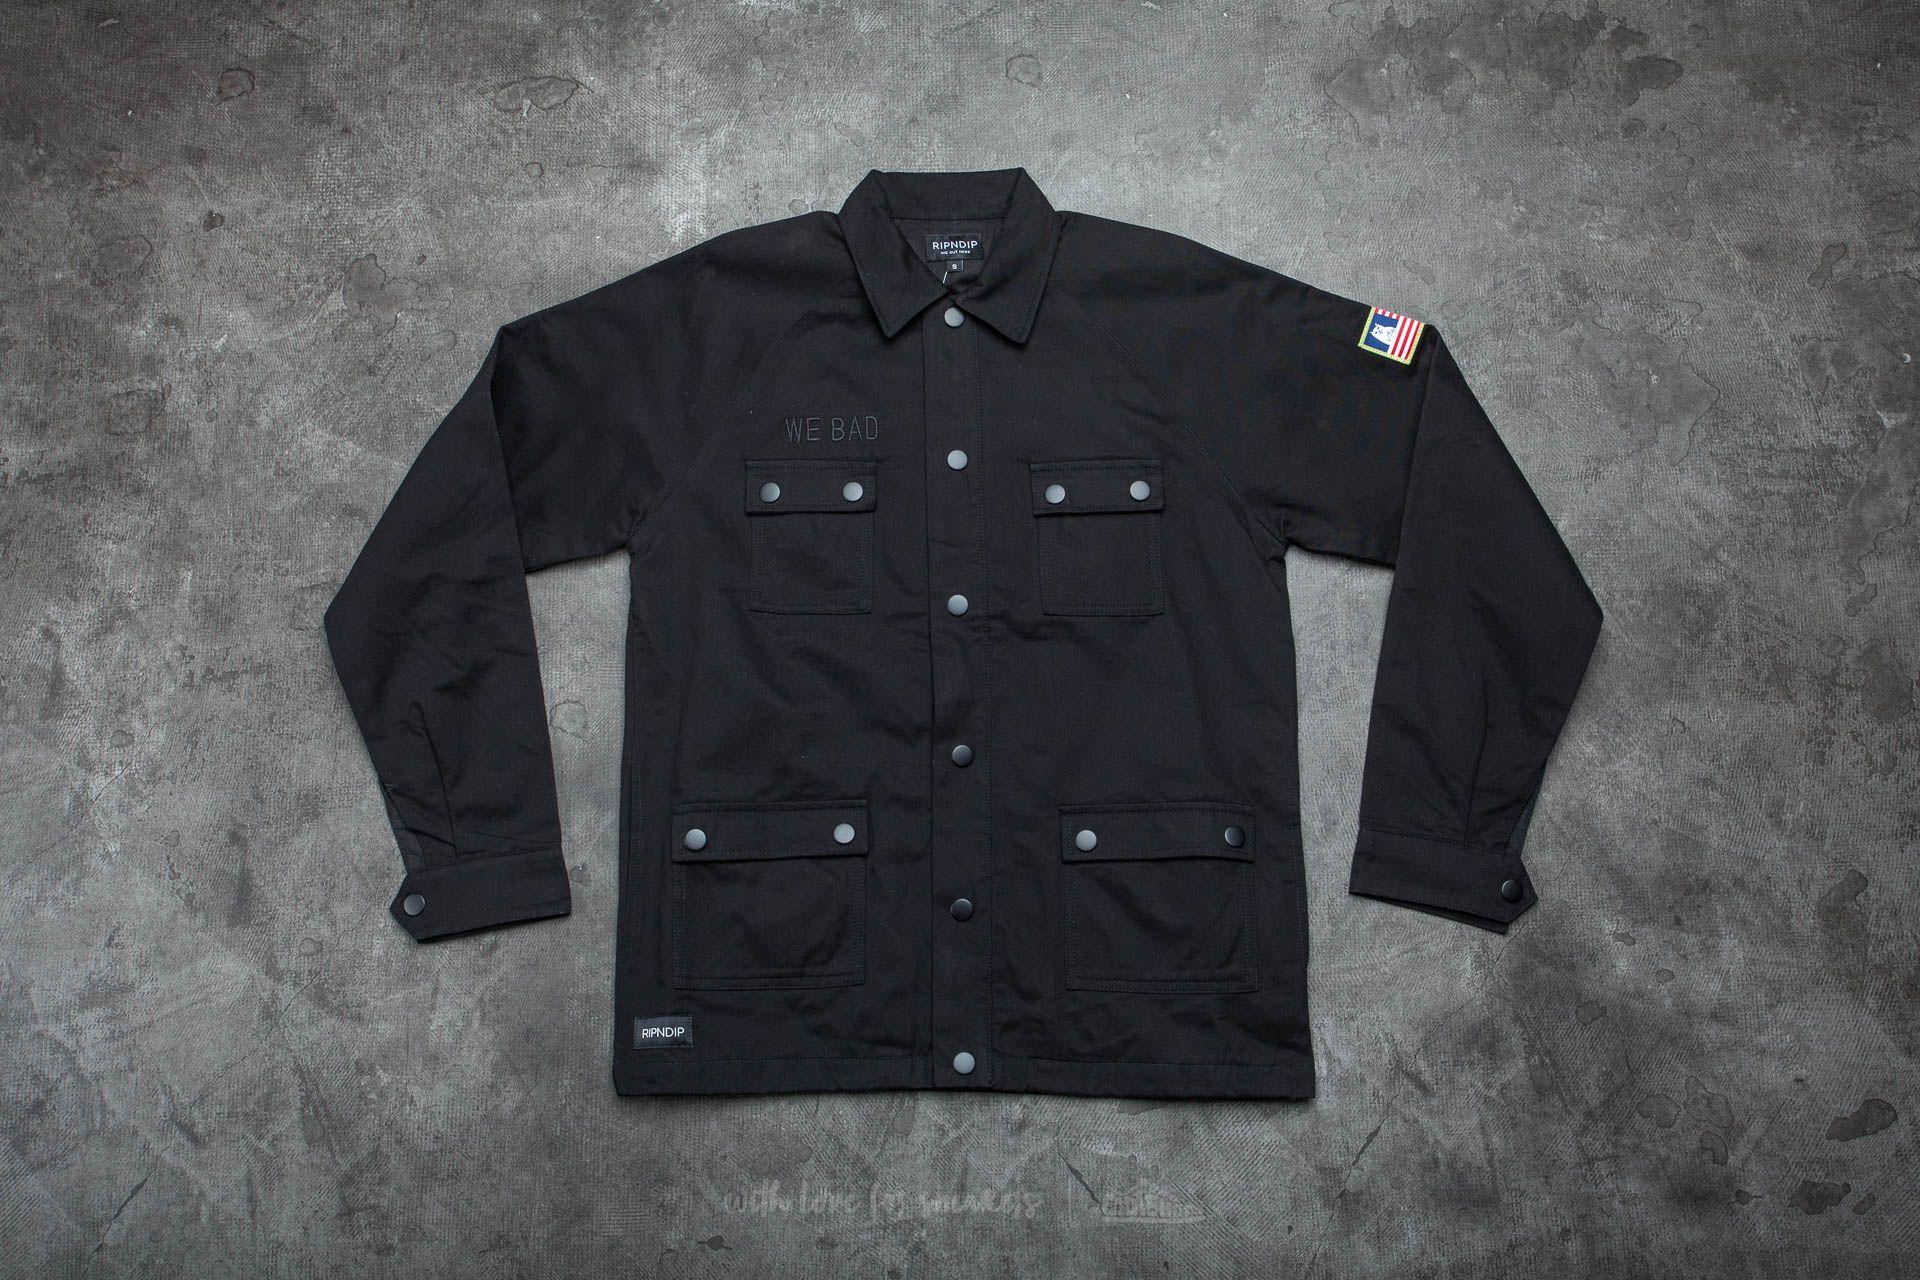 RIPNDIP M69 We Bad Jacket Black